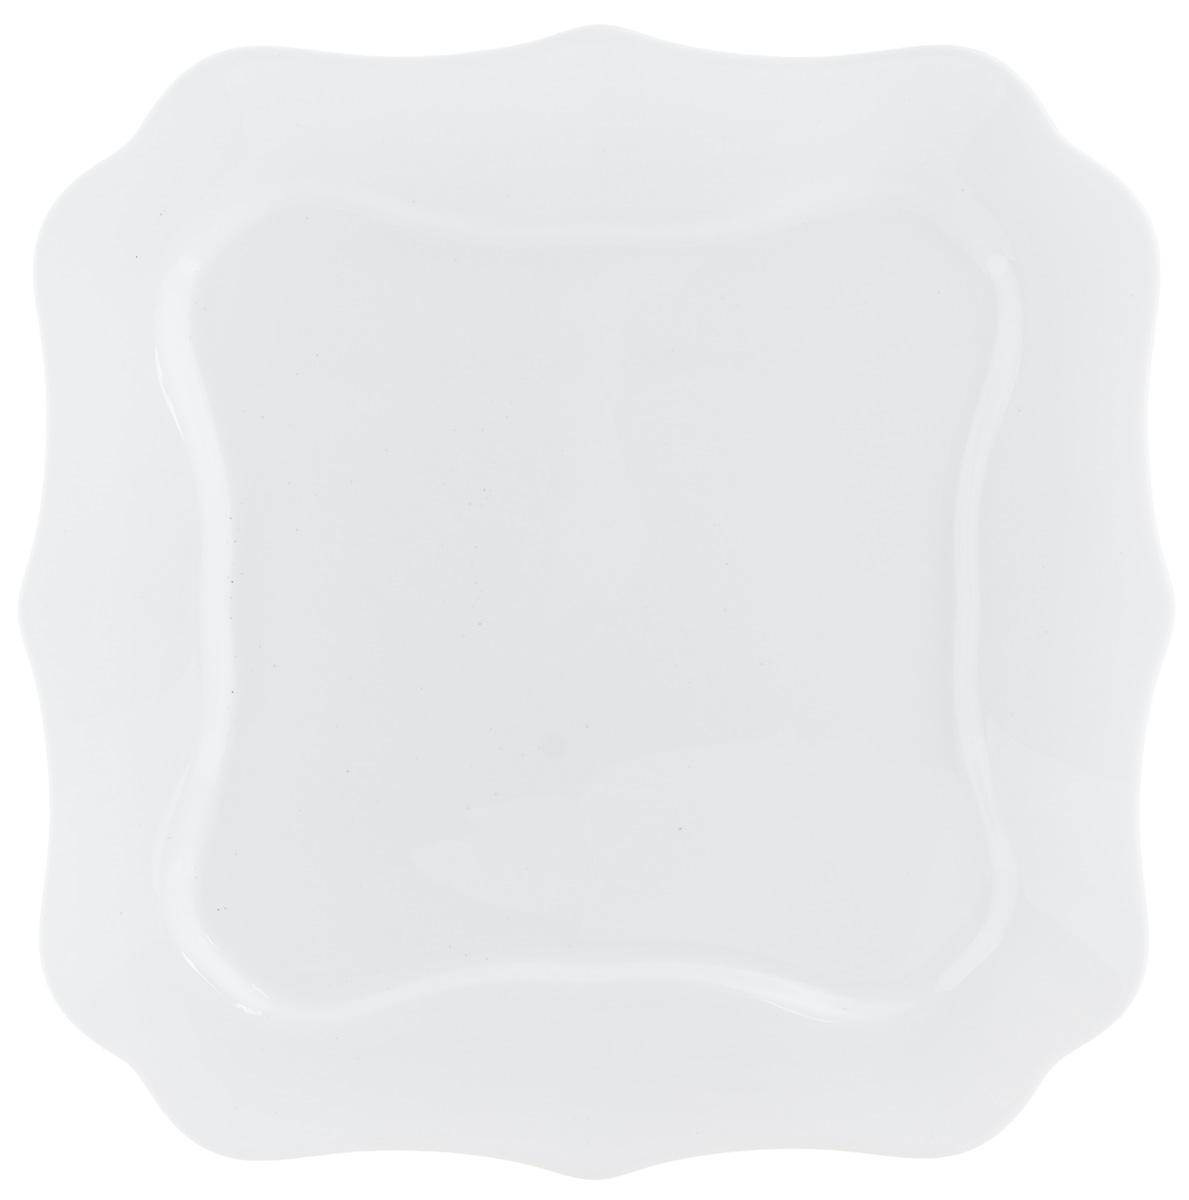 Тарелка обеденная Luminarc, 26 х 26 см тарелка обеденная terracotta дерево жизни диаметр 26 см